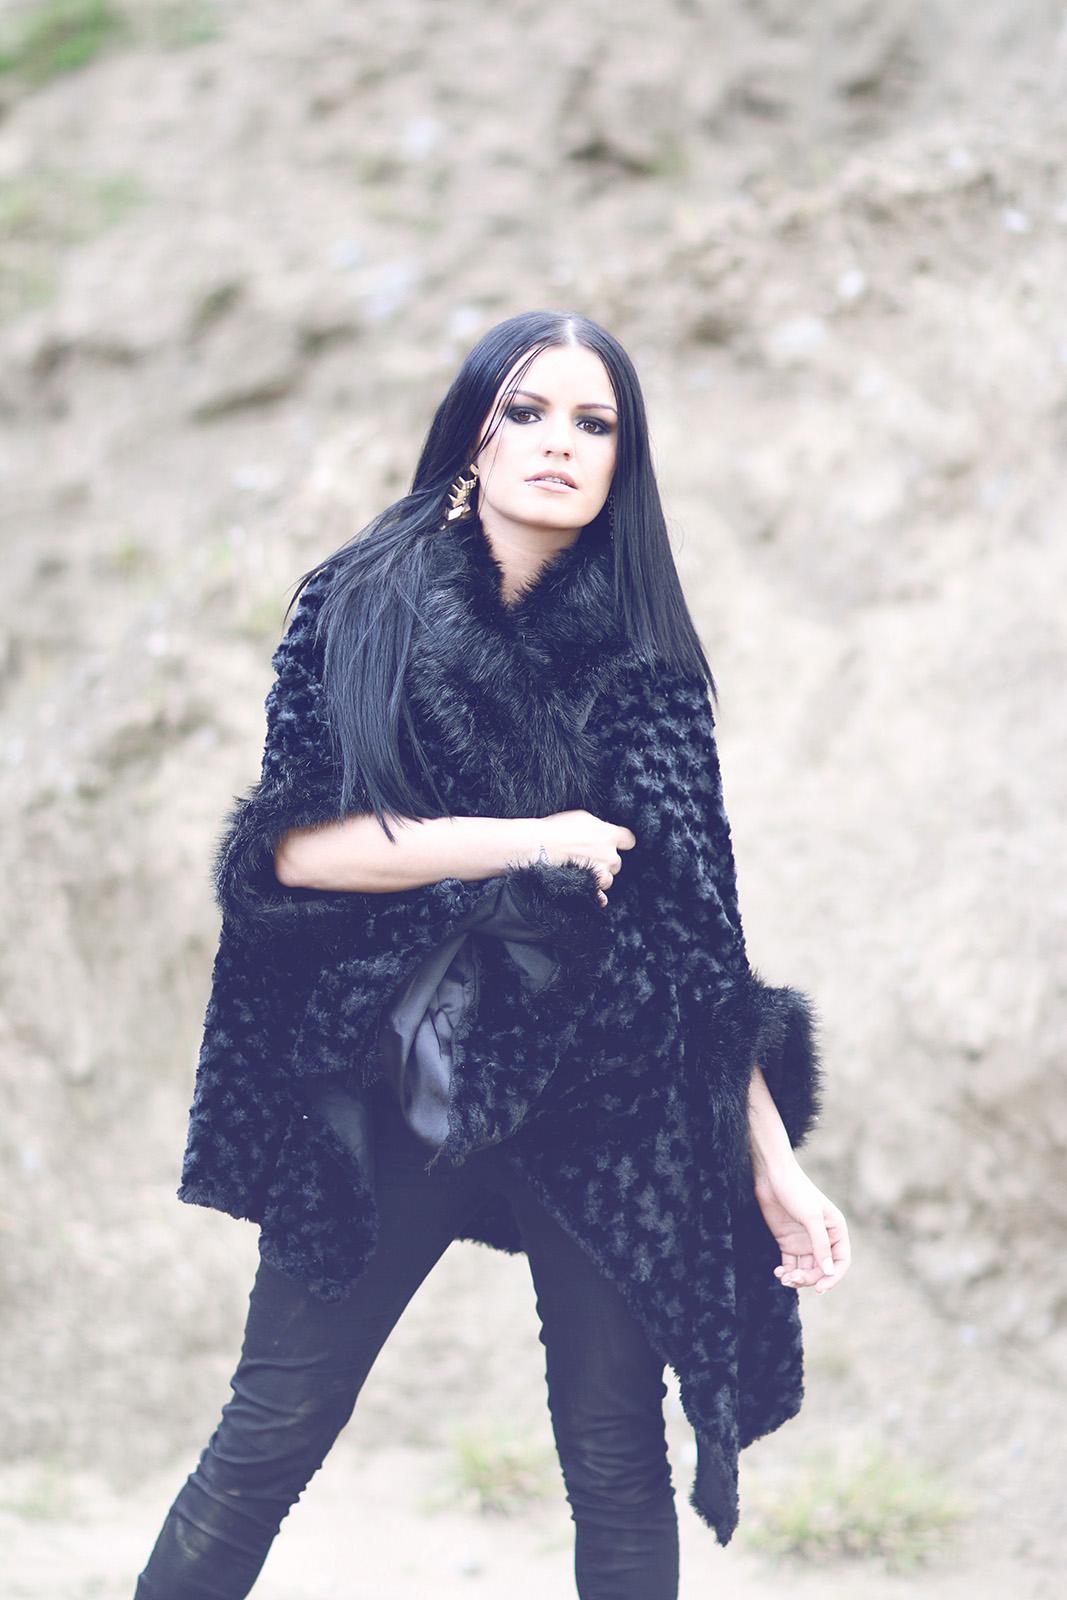 fashion photography and model portfolio northern ireland